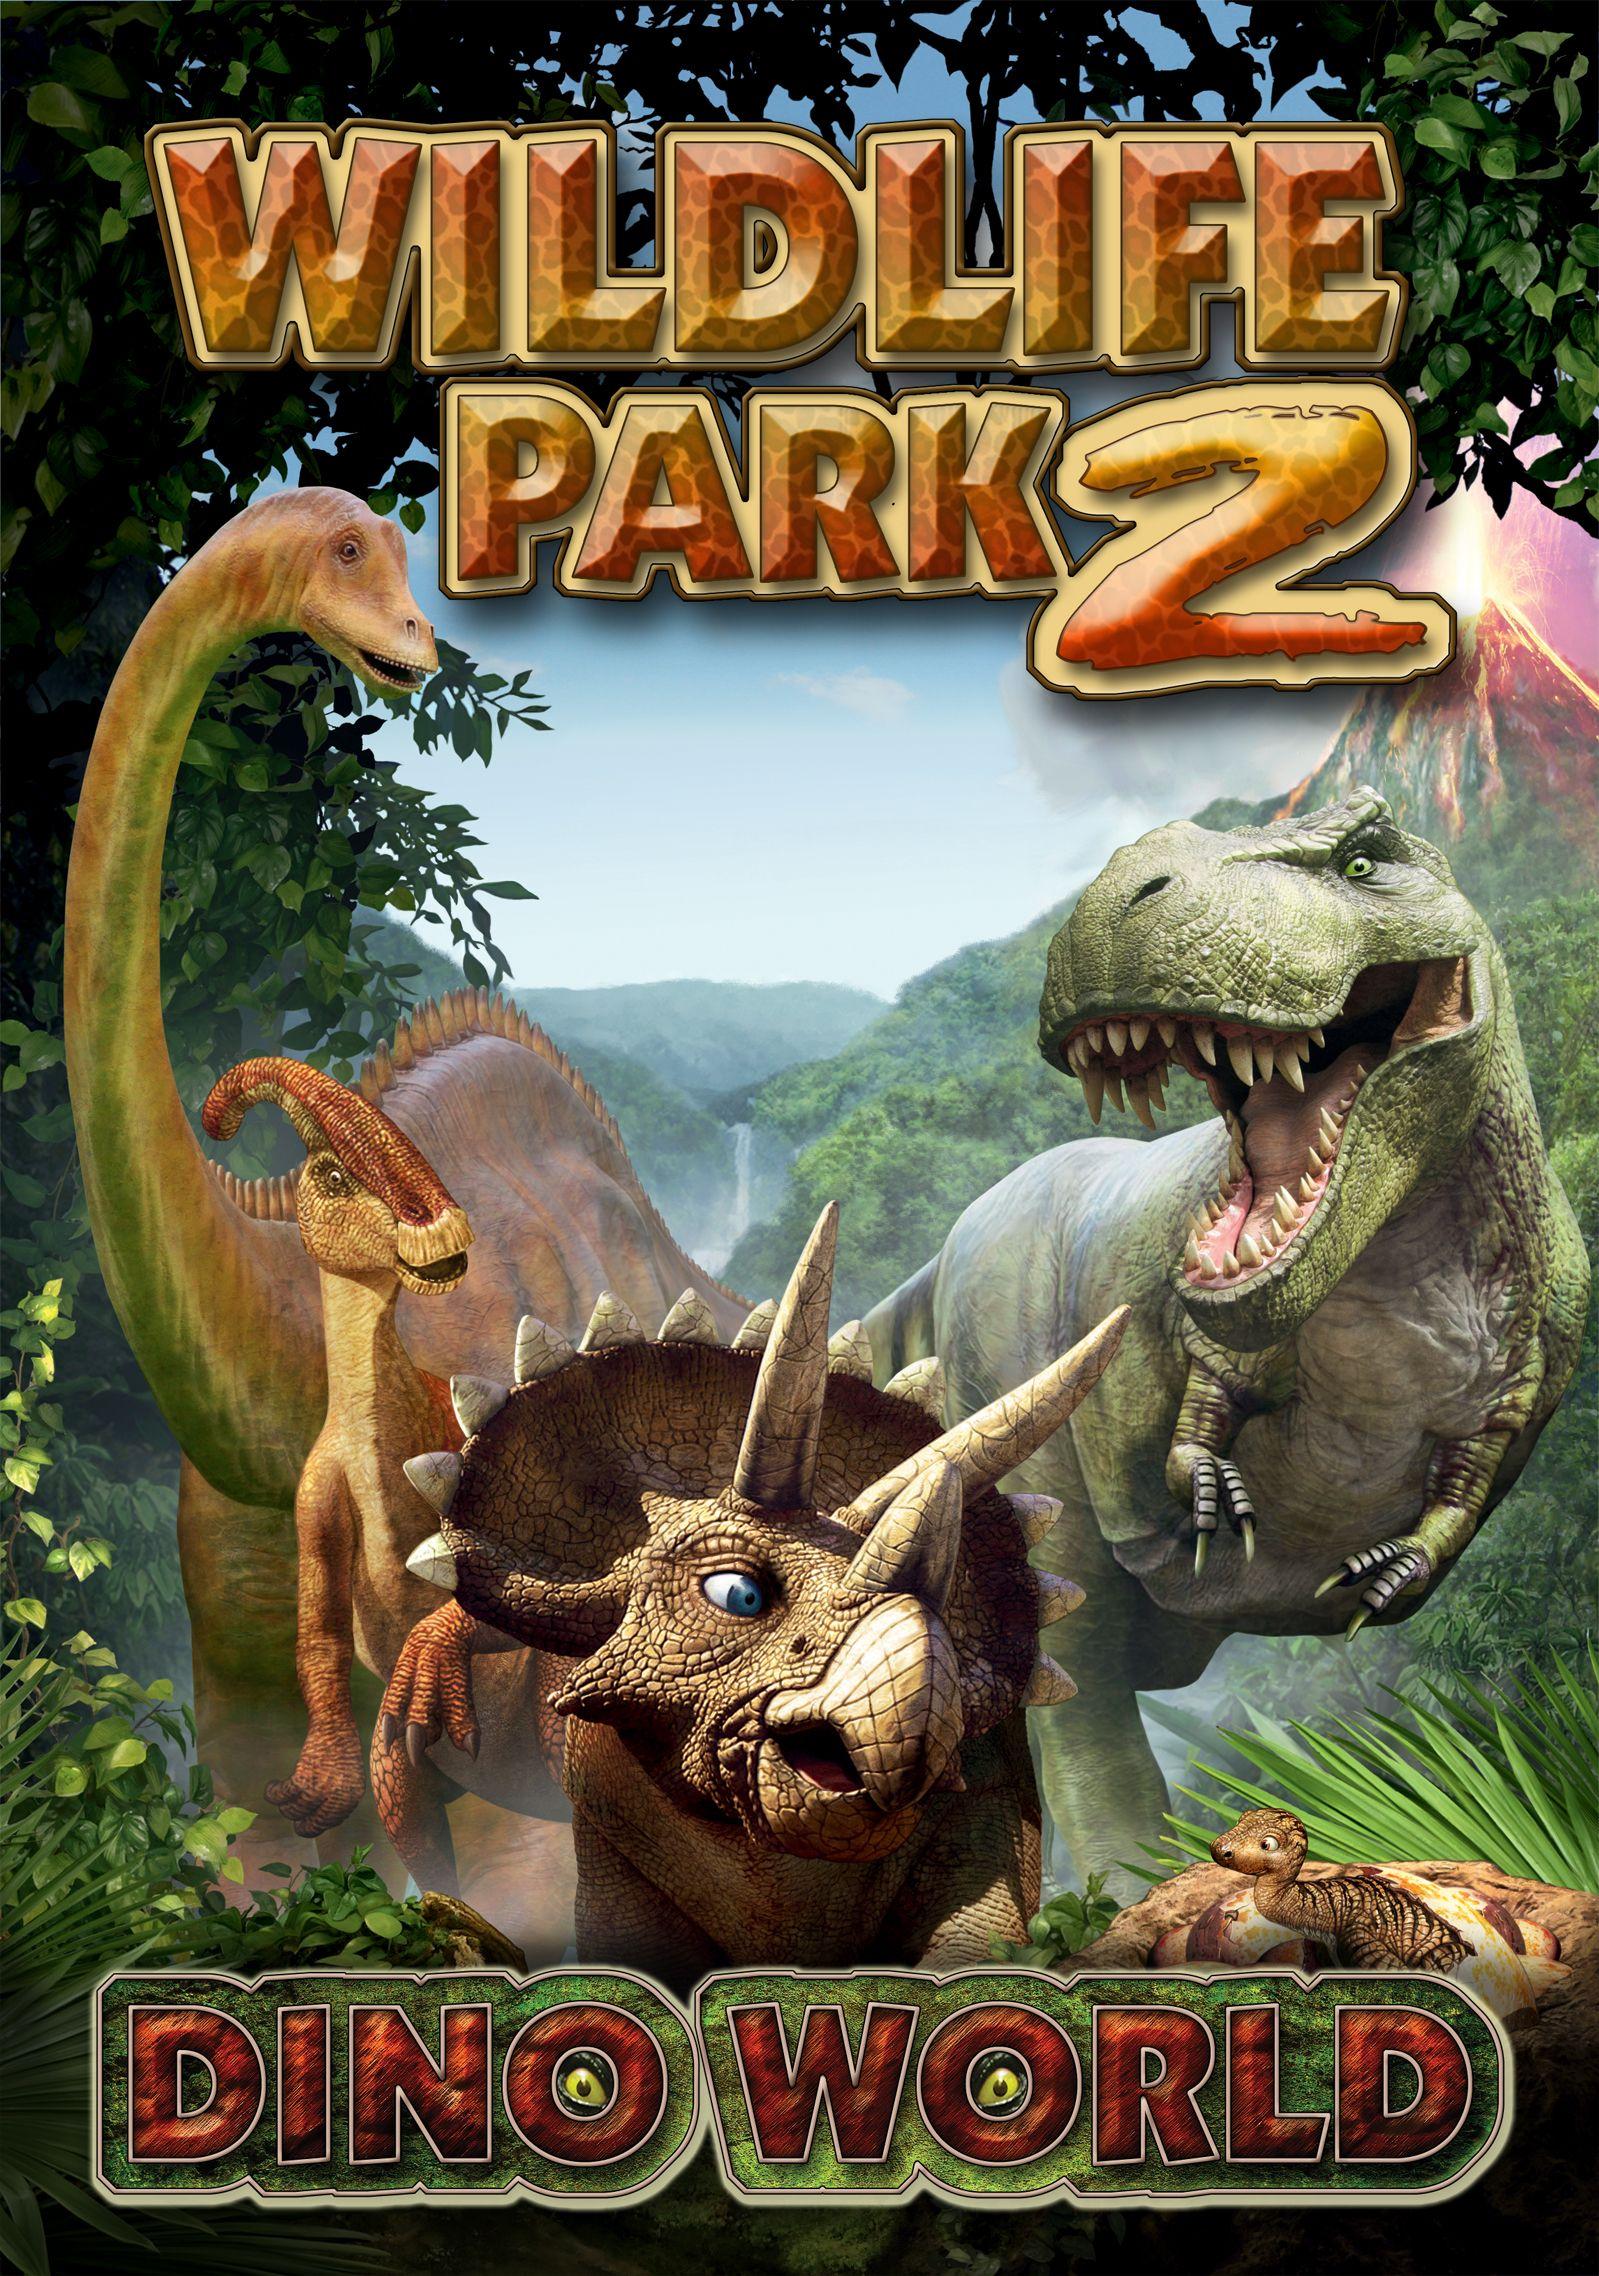 Wildlife Park 2 [PC Code - Steam]: Amazon.co.uk: PC & Video Games